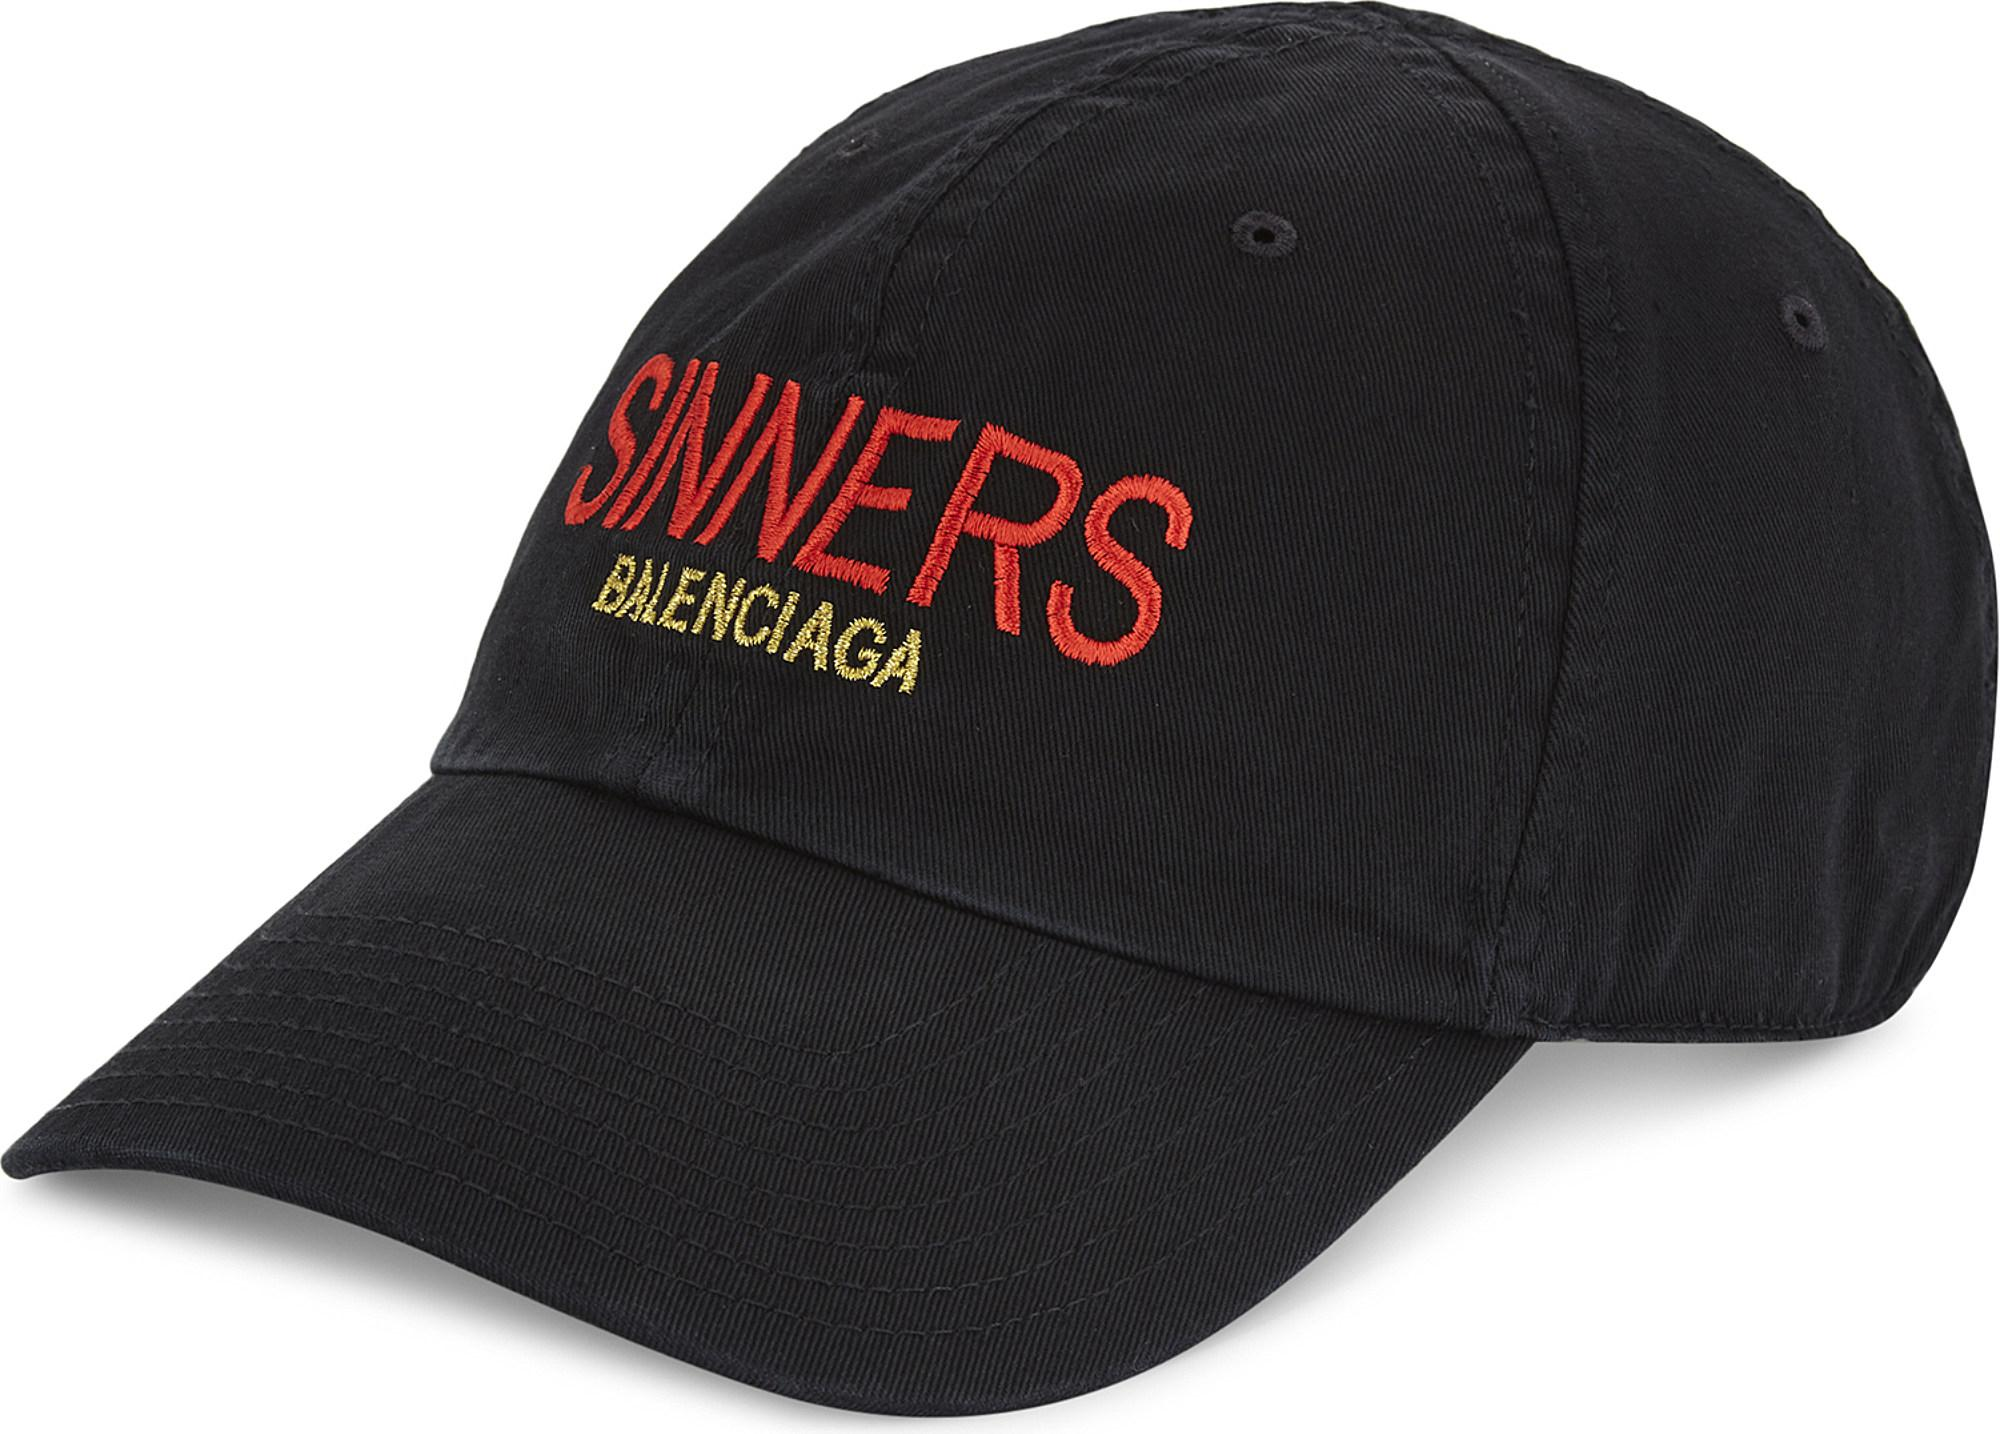 2c610674e47 Lyst - Balenciaga Sinner Capsule Cotton Strapback Cap in Black for Men